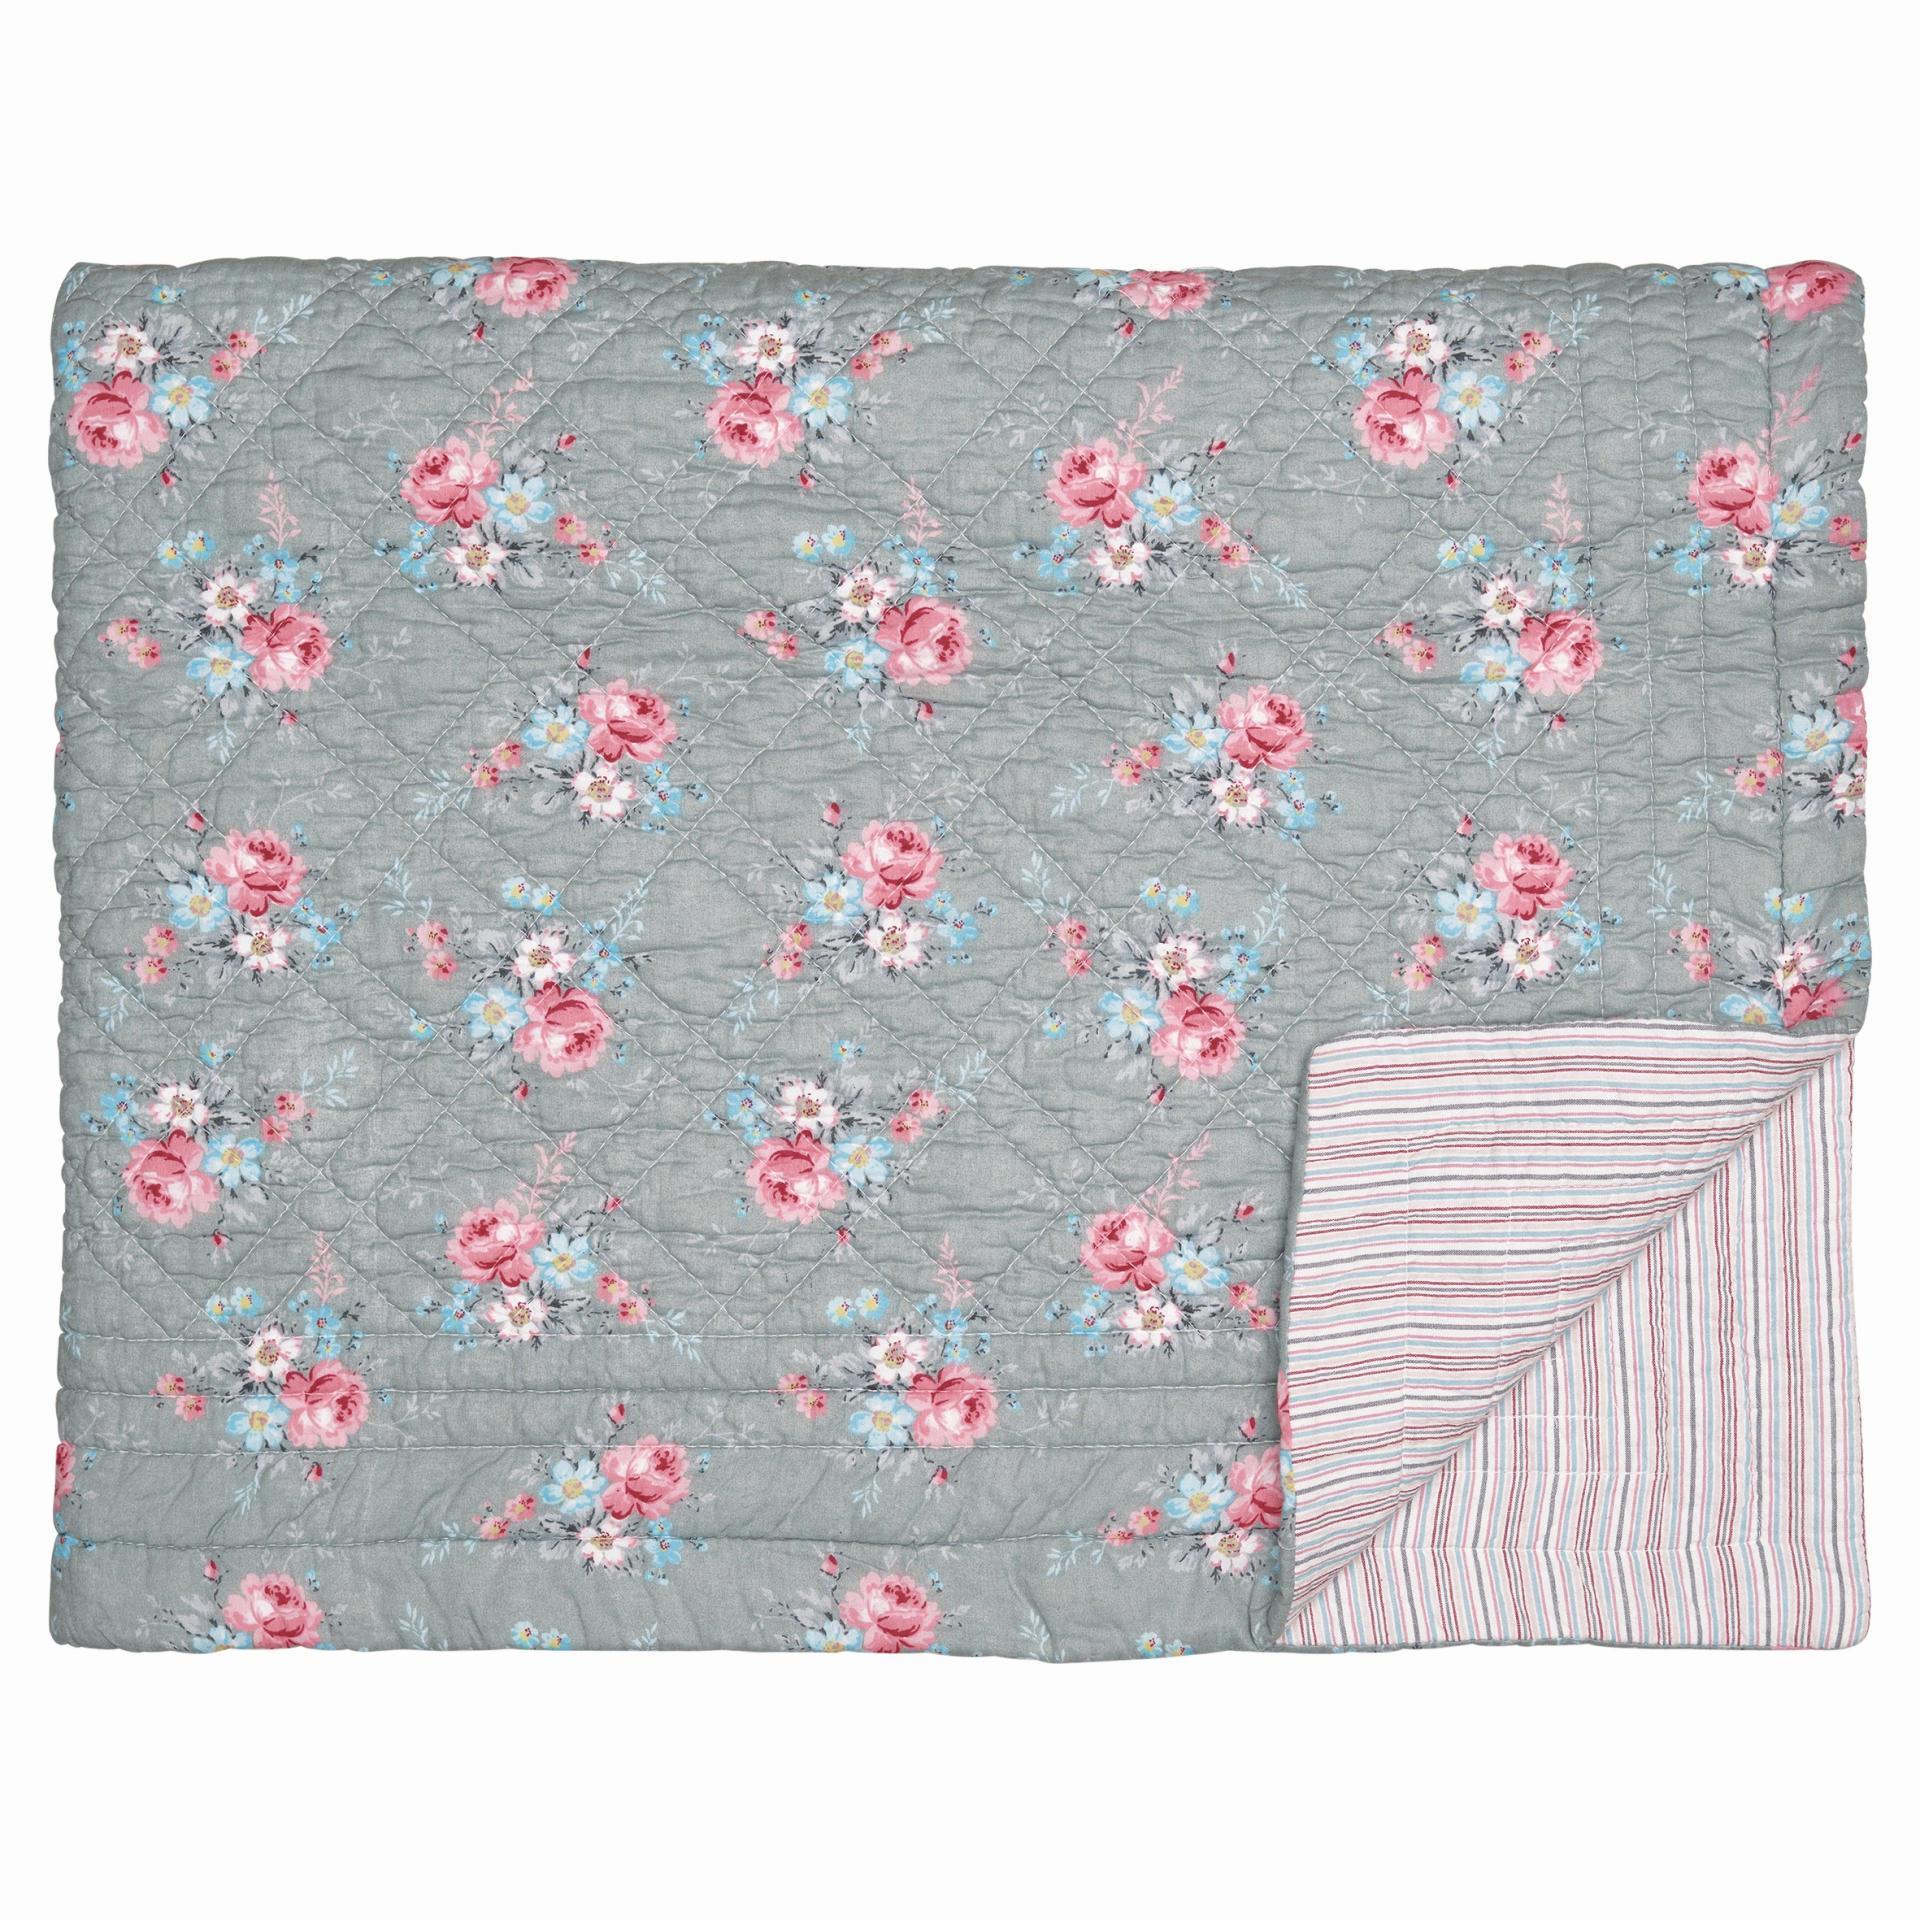 GREEN GATE Prošívaný přehoz Marie grey 180x230 cm, růžová barva, šedá barva, textil